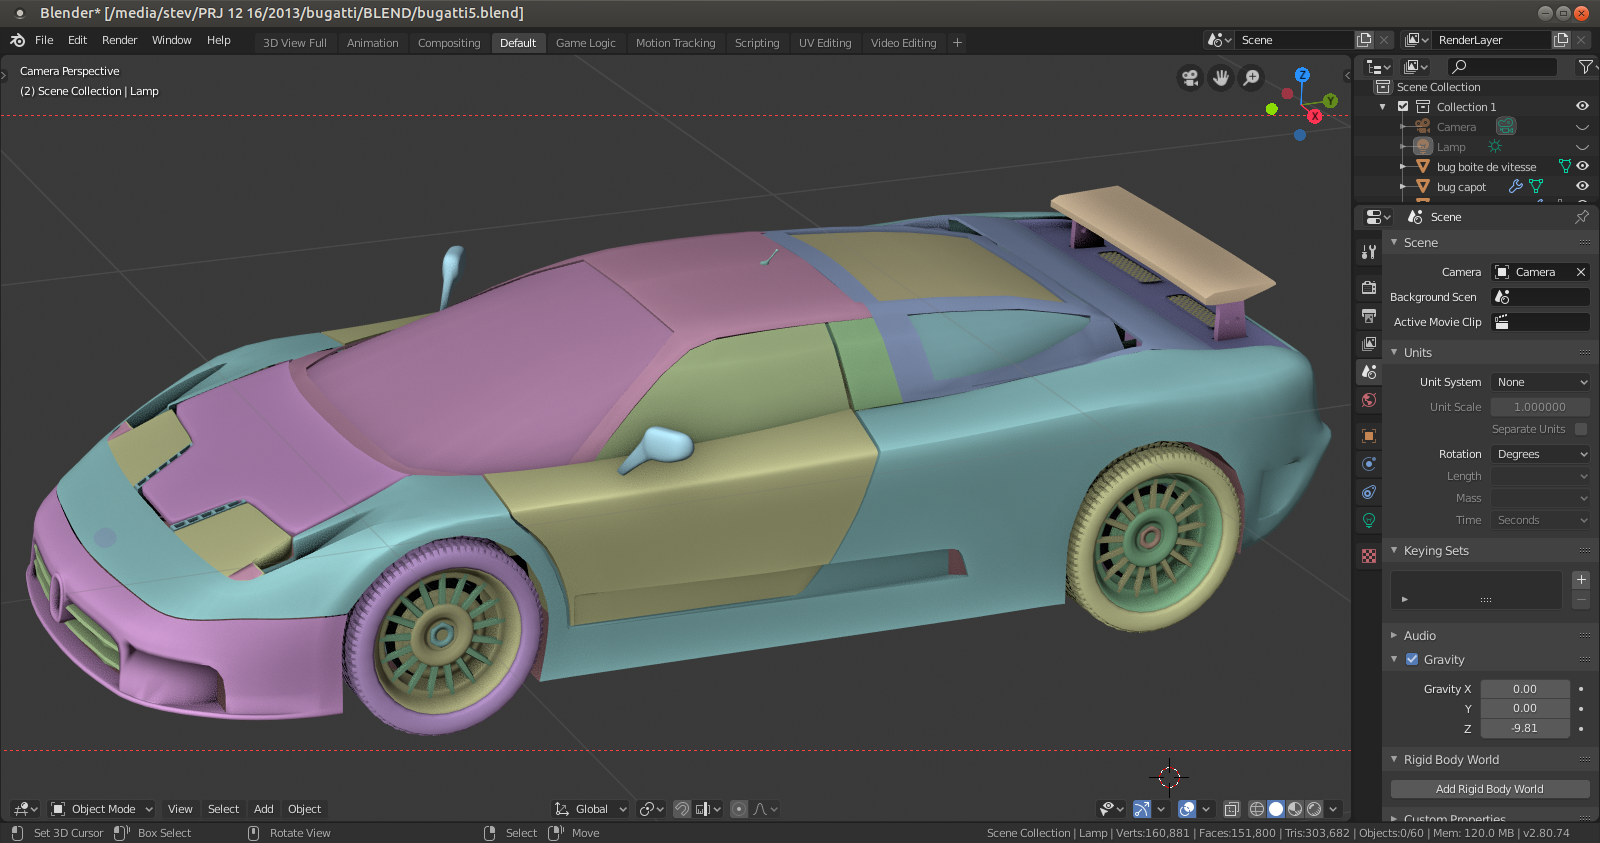 Blender 2.8 - Interface - logiciel 3d - voiture de sport